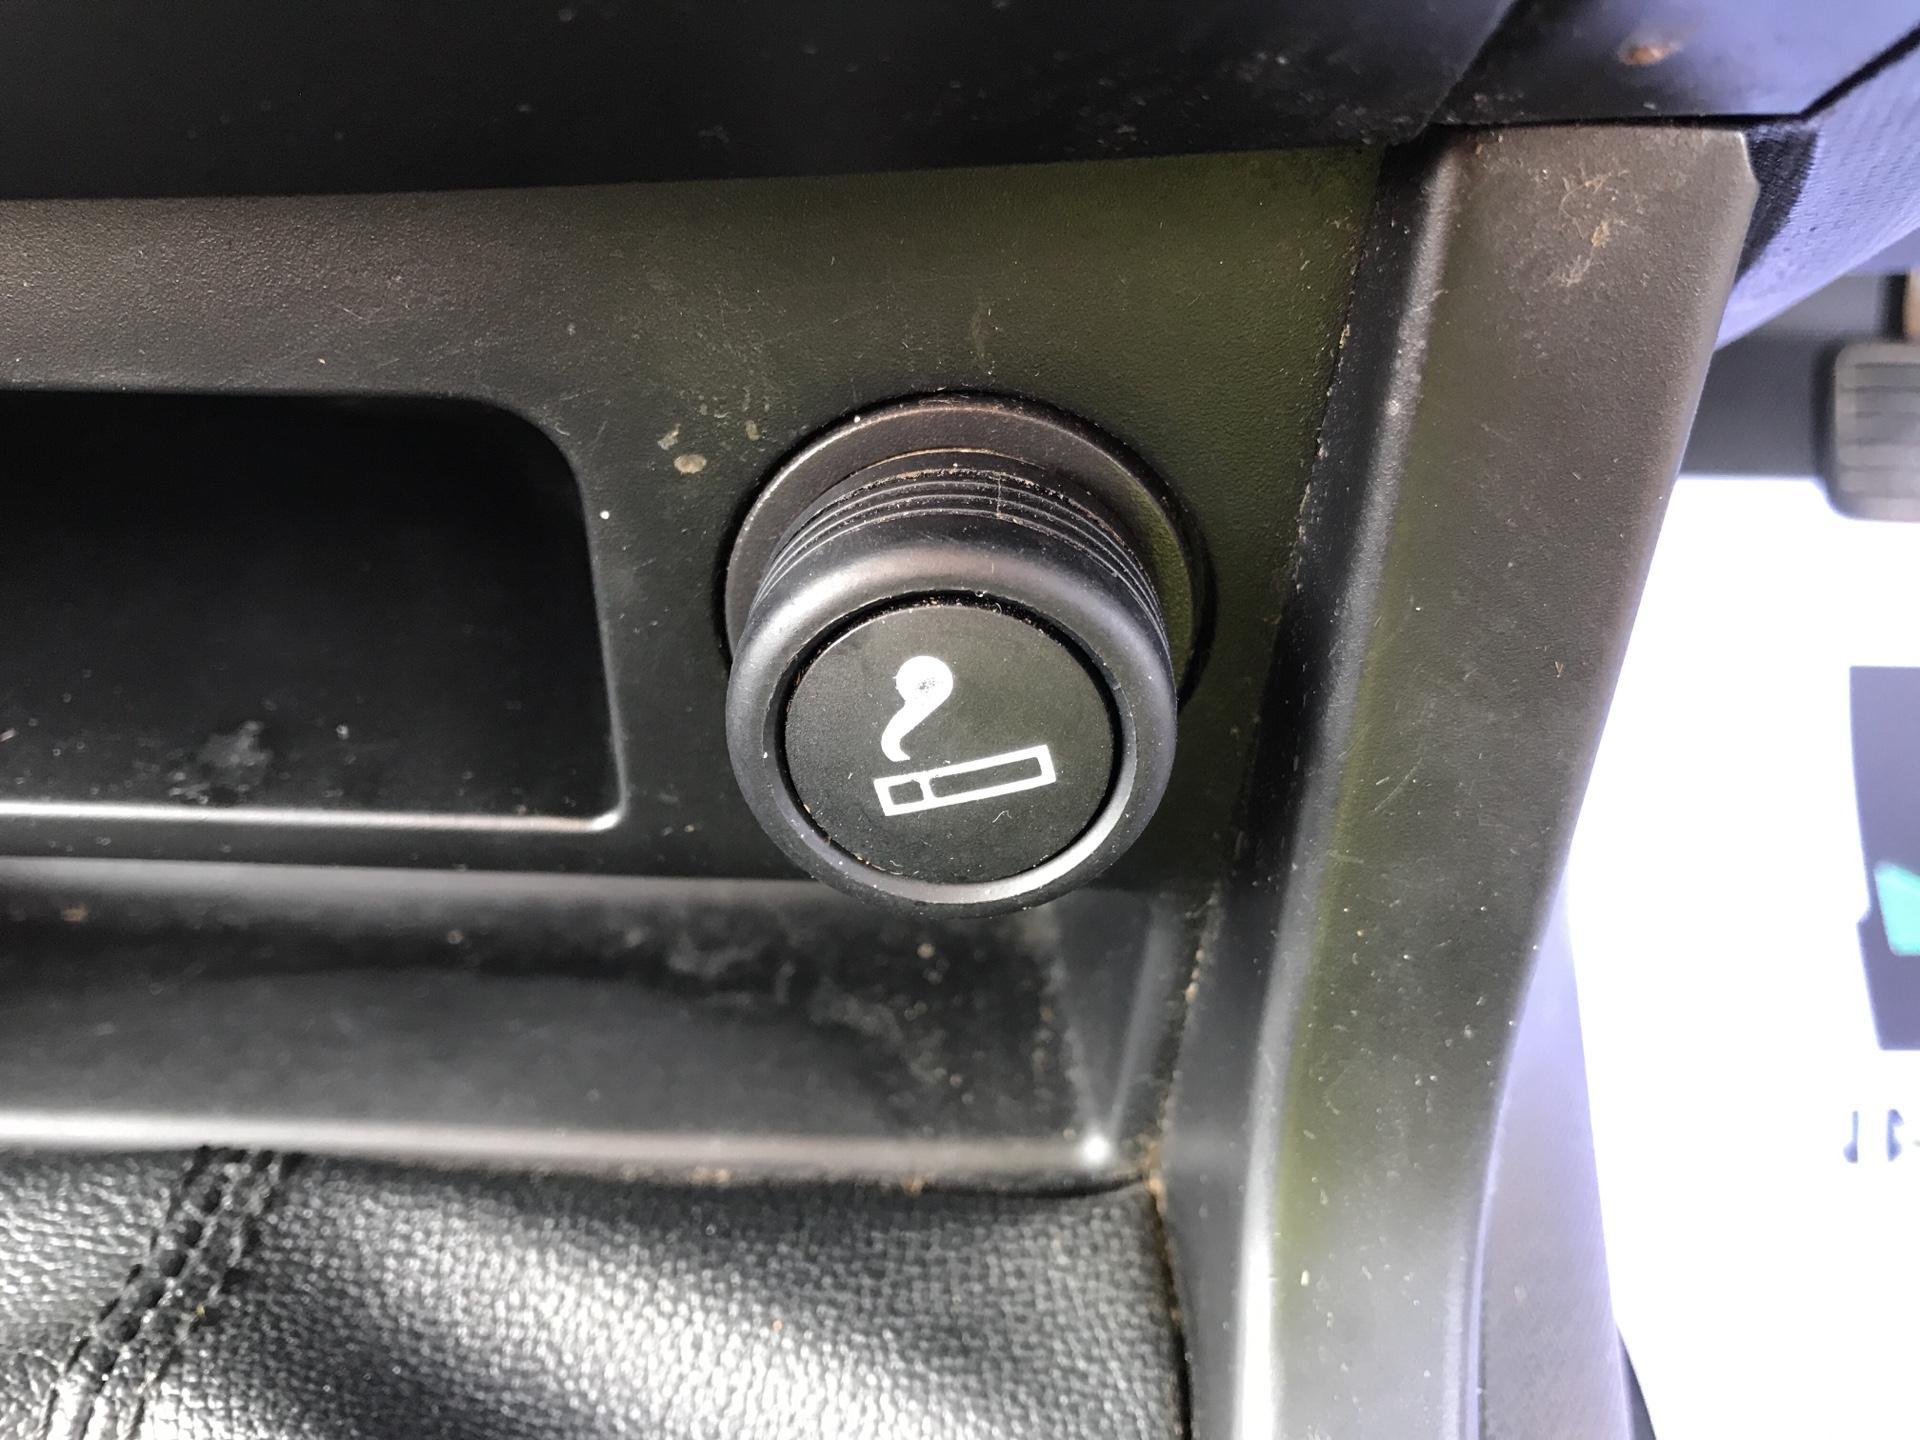 2016 Isuzu D-Max  Double Cab 4 x 4 2.5 TD Euro 5 (YD16PGF) Image 17